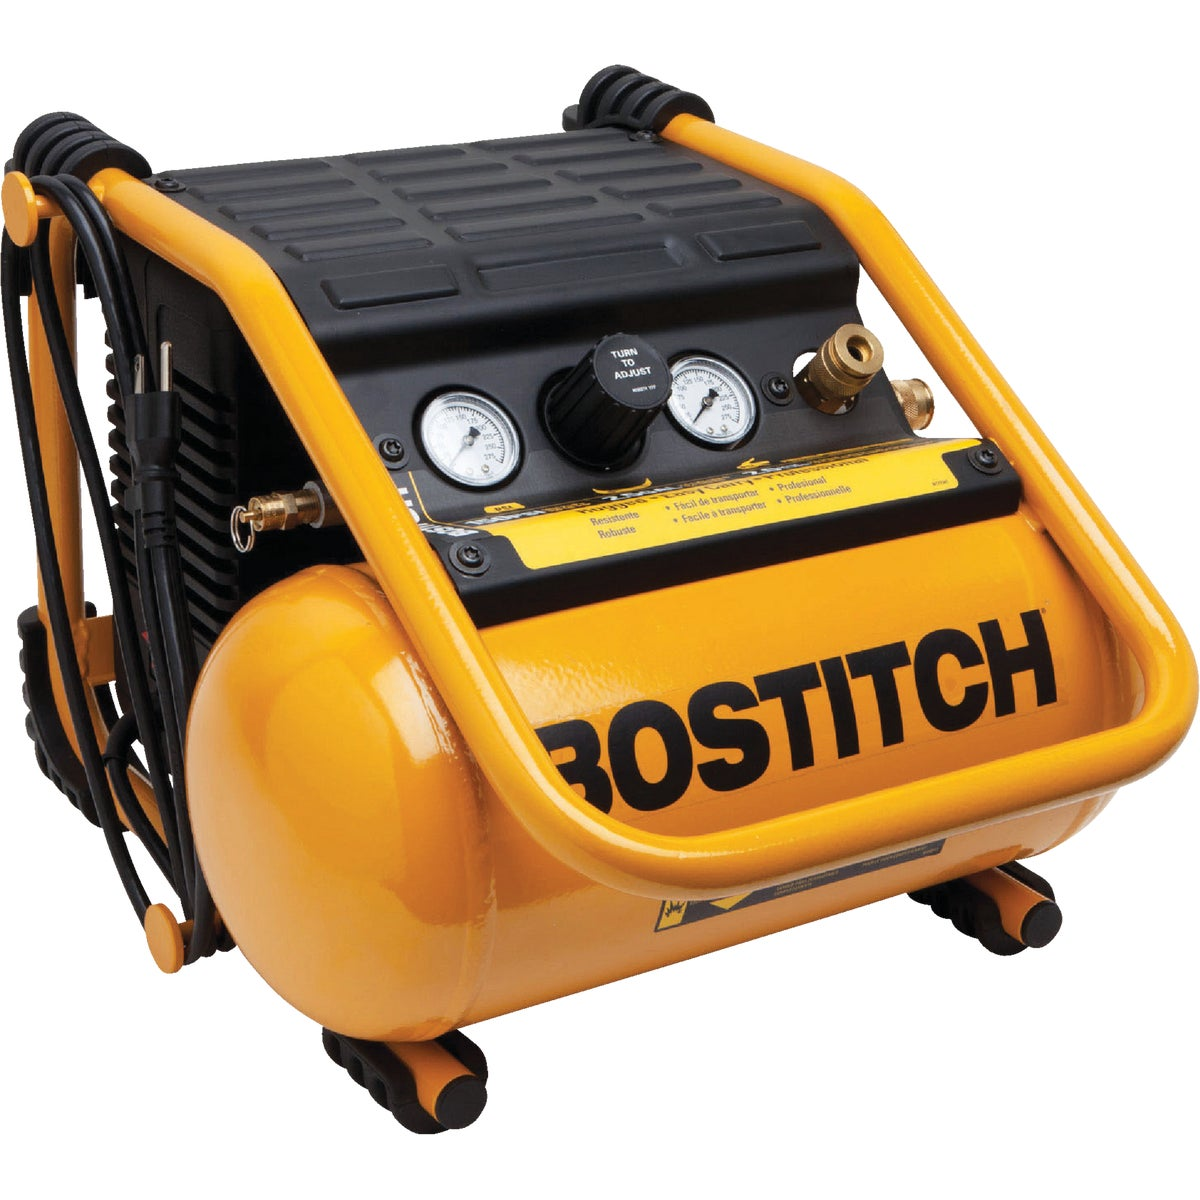 Bostitch 2.5 Gal. Suitcase Style Air Compressor